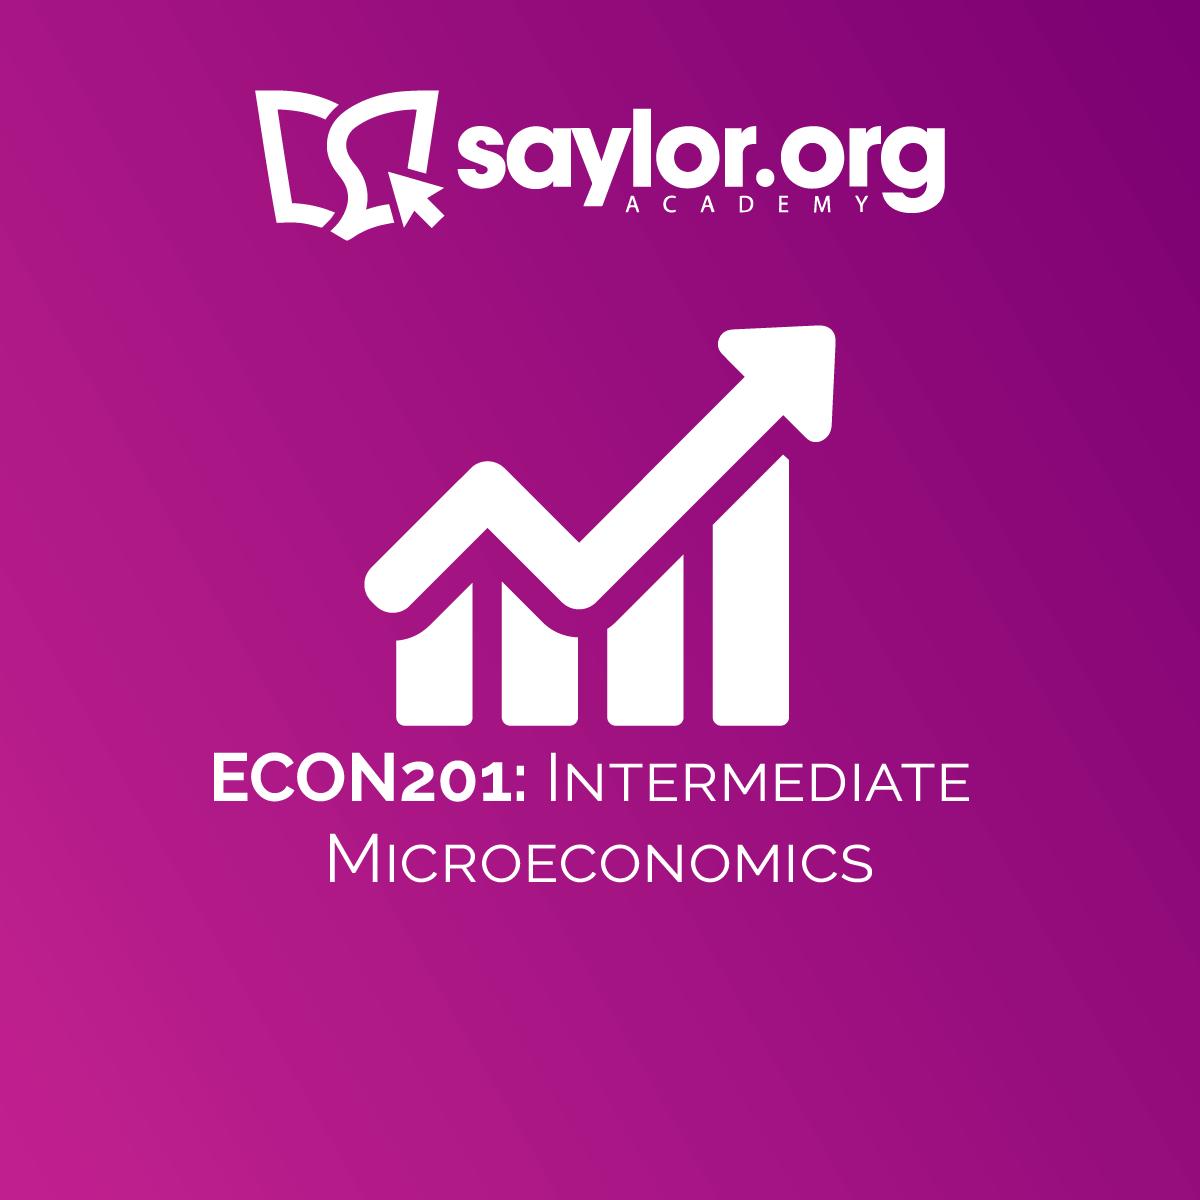 ECON201: Intermediate Microeconomics | Saylor Academy